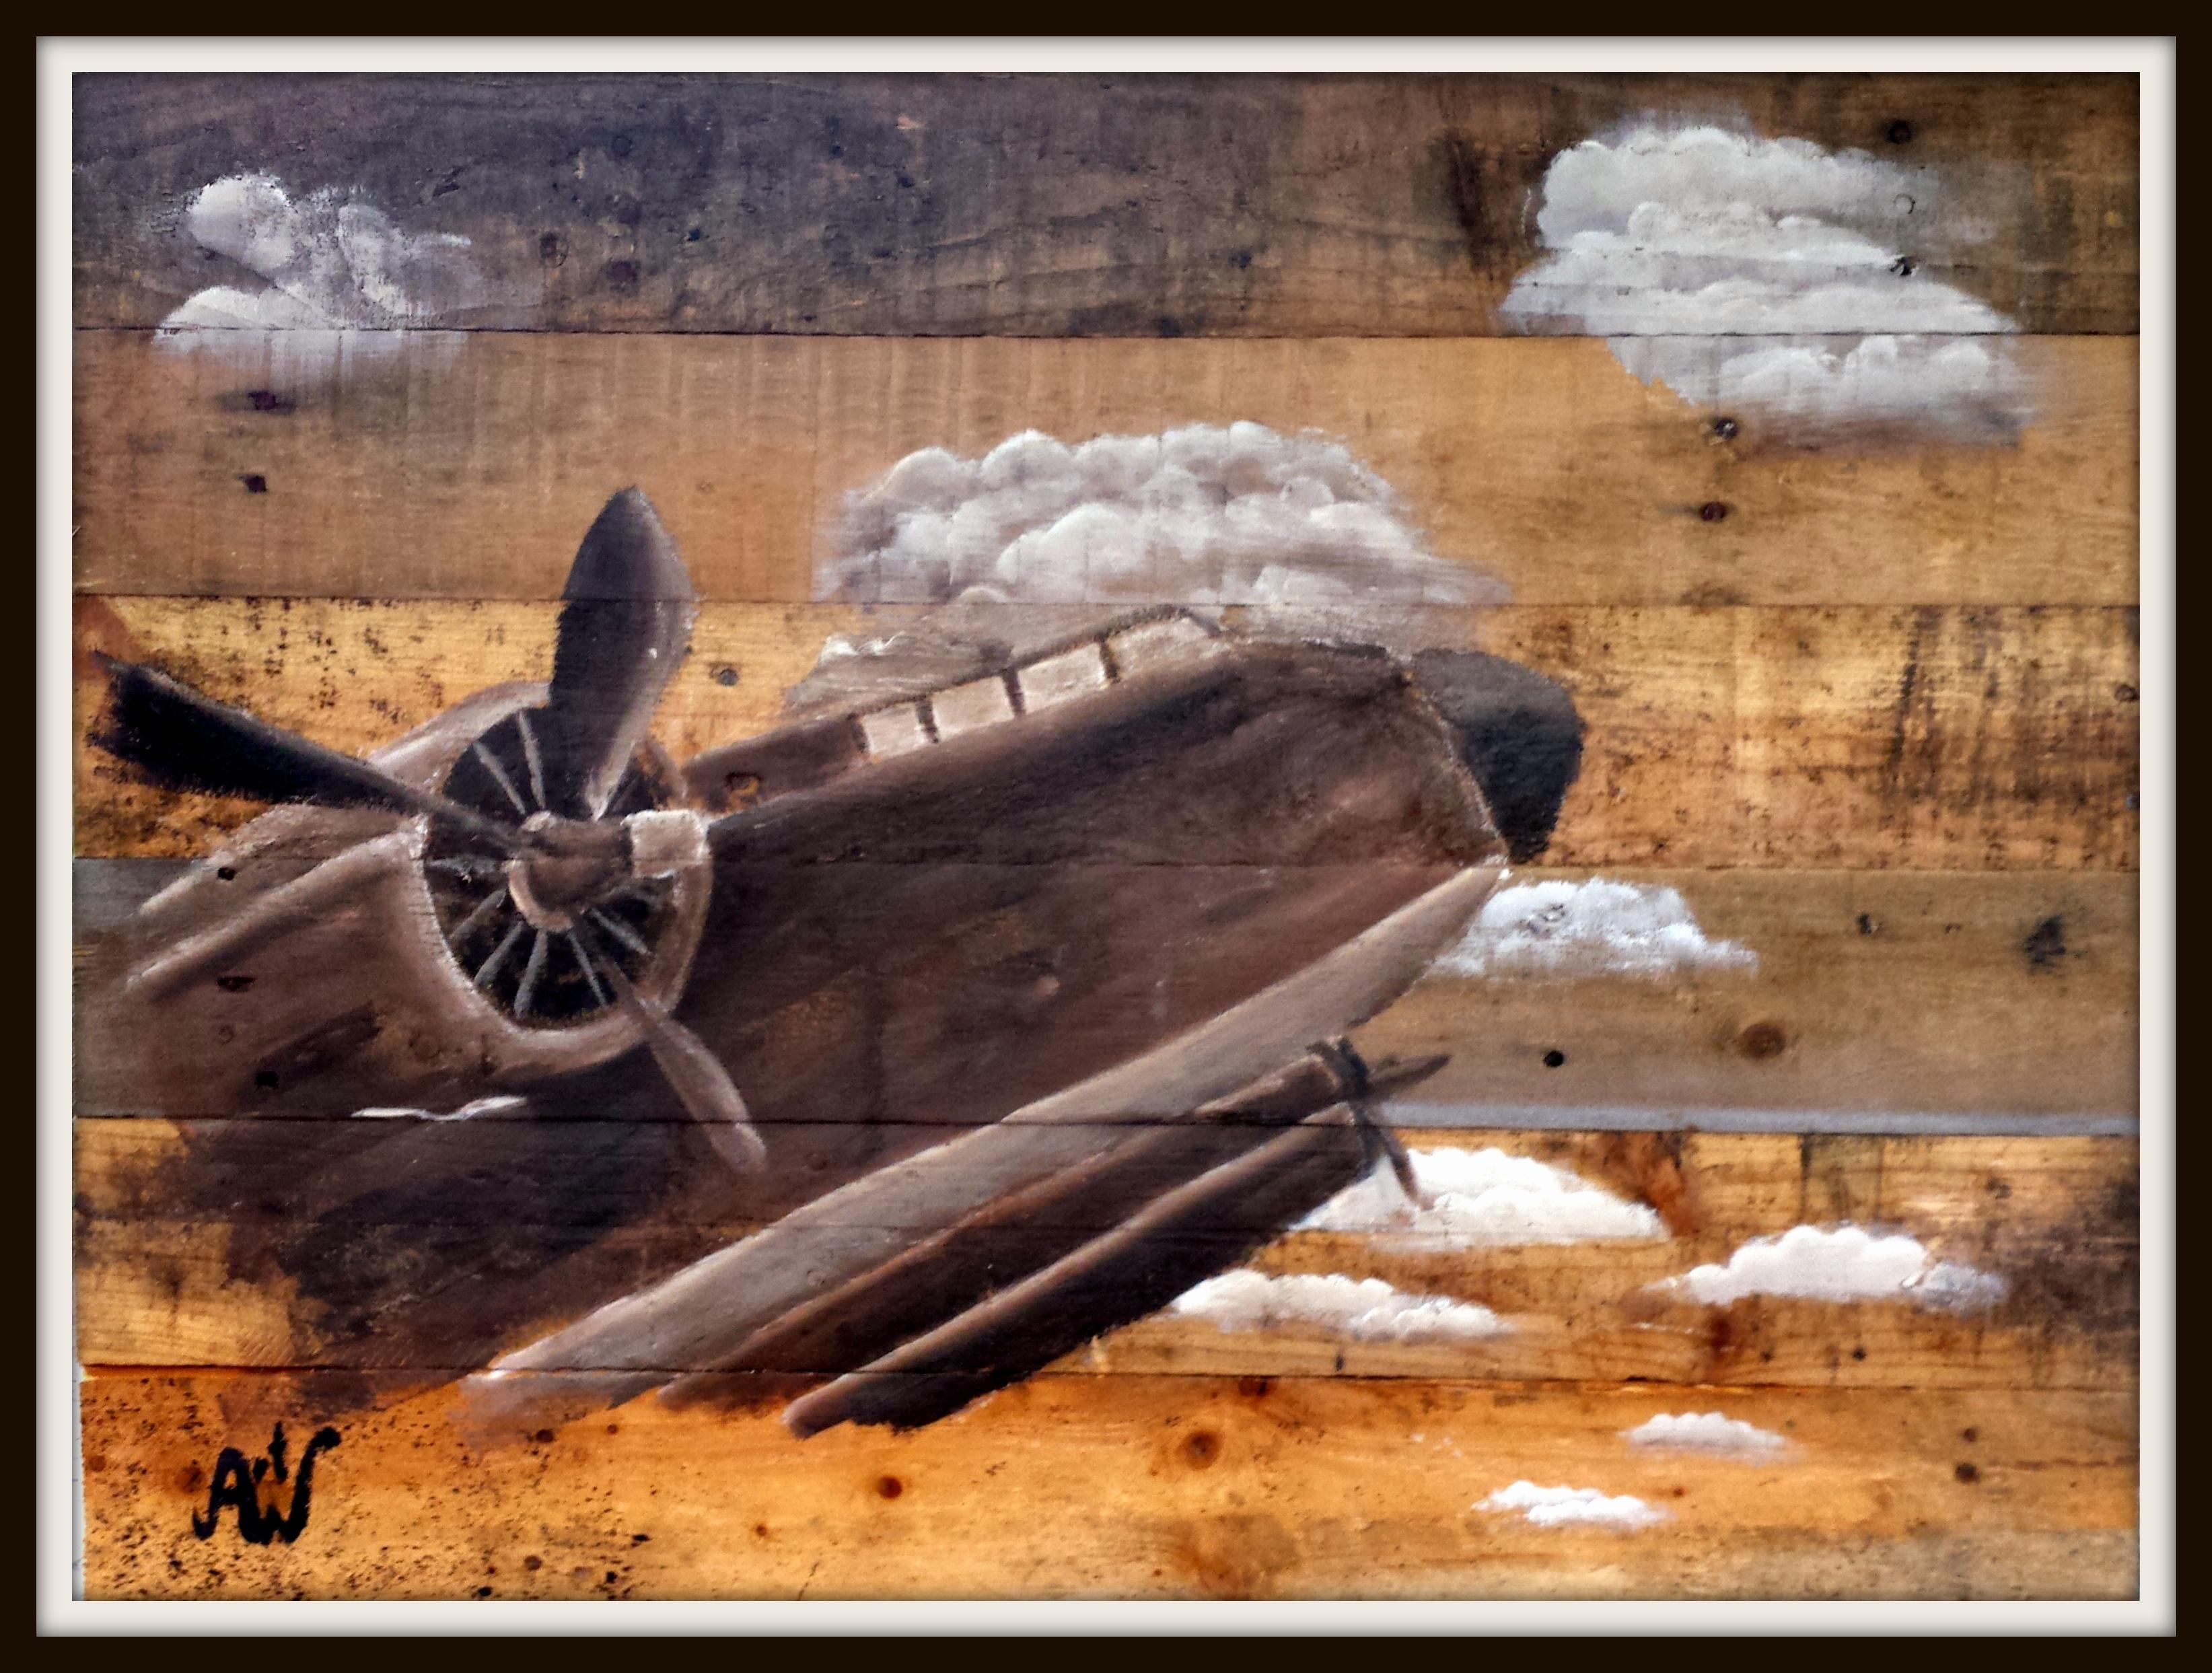 Airplane, 60*80 cm. Acryl op sloophout. Verkocht/sold